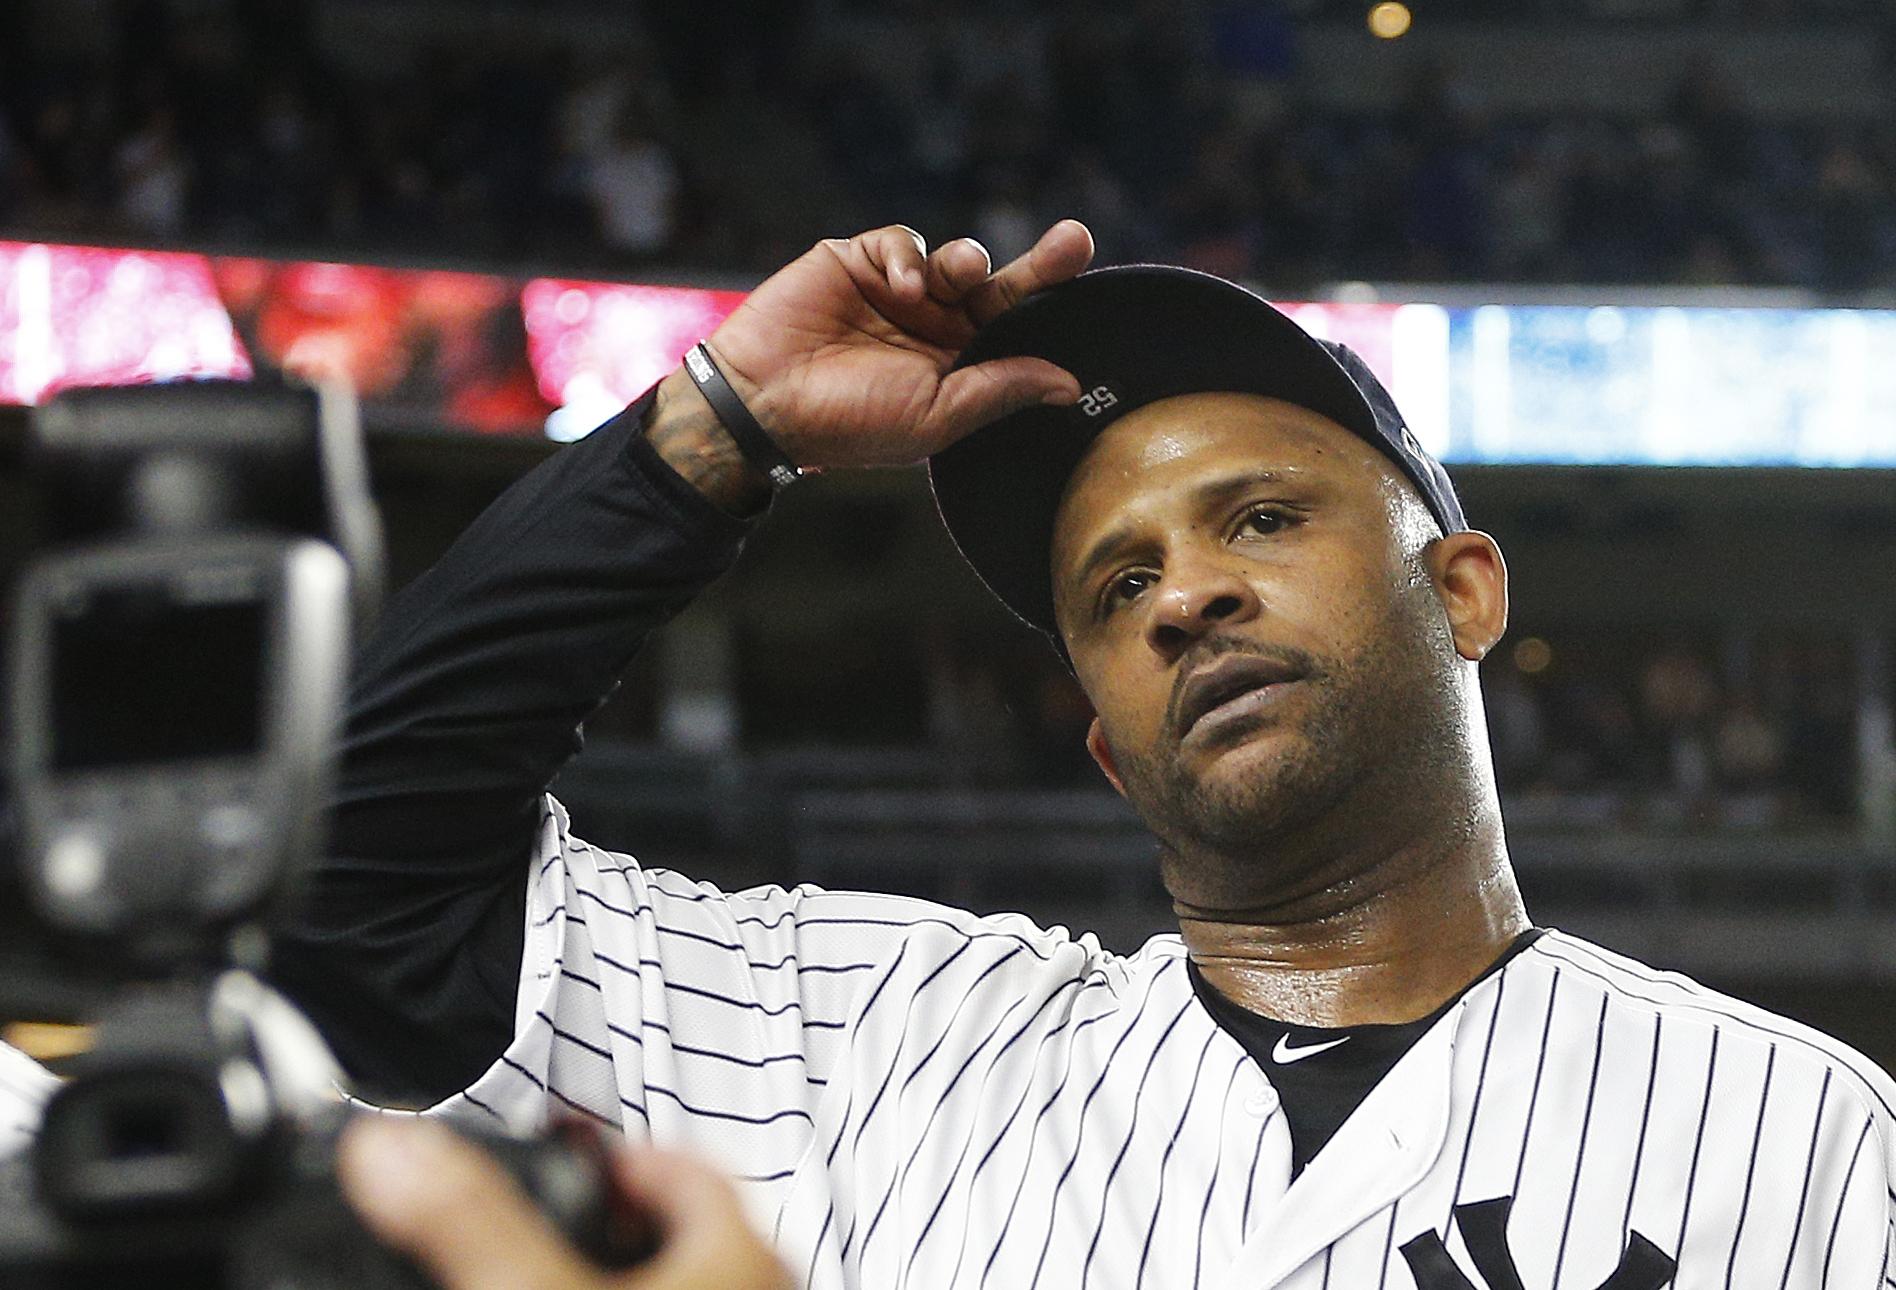 CC Sabathia gets massive ovation from fans in final regular-season game at Yankee Stadium (Video)